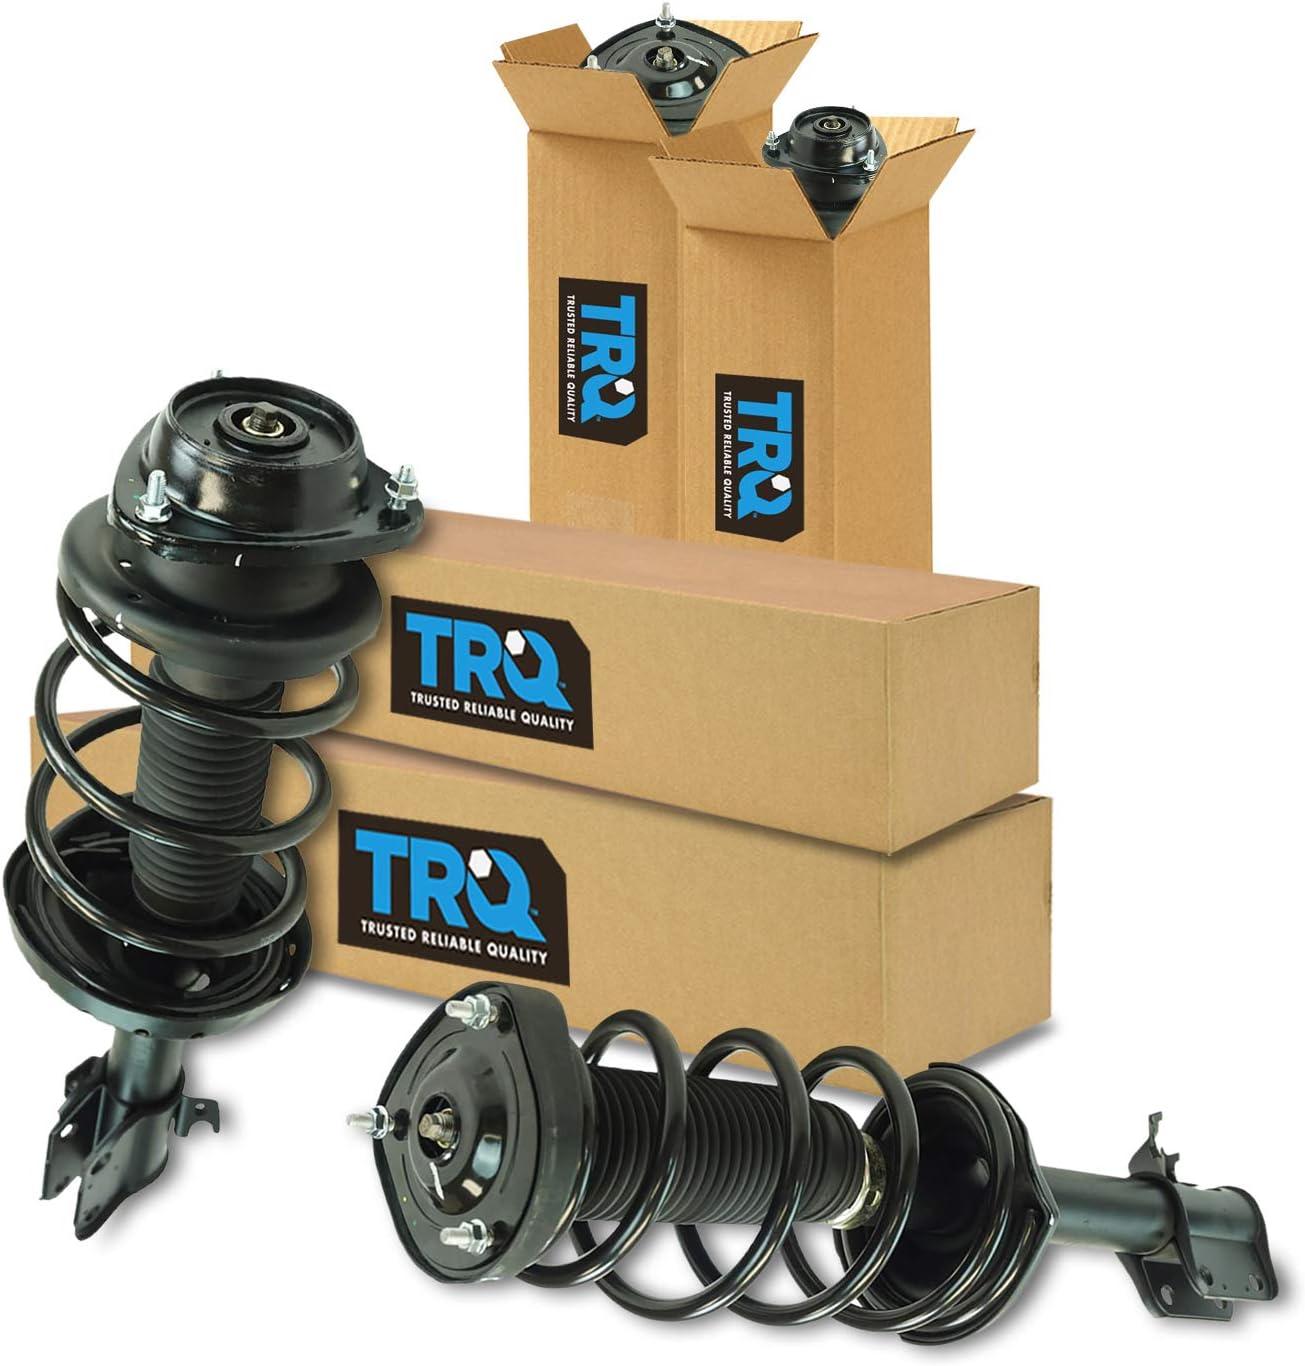 TRQ Complete Loaded Strut Spring Assembly Front /& Rear Kit for Subaru Forester